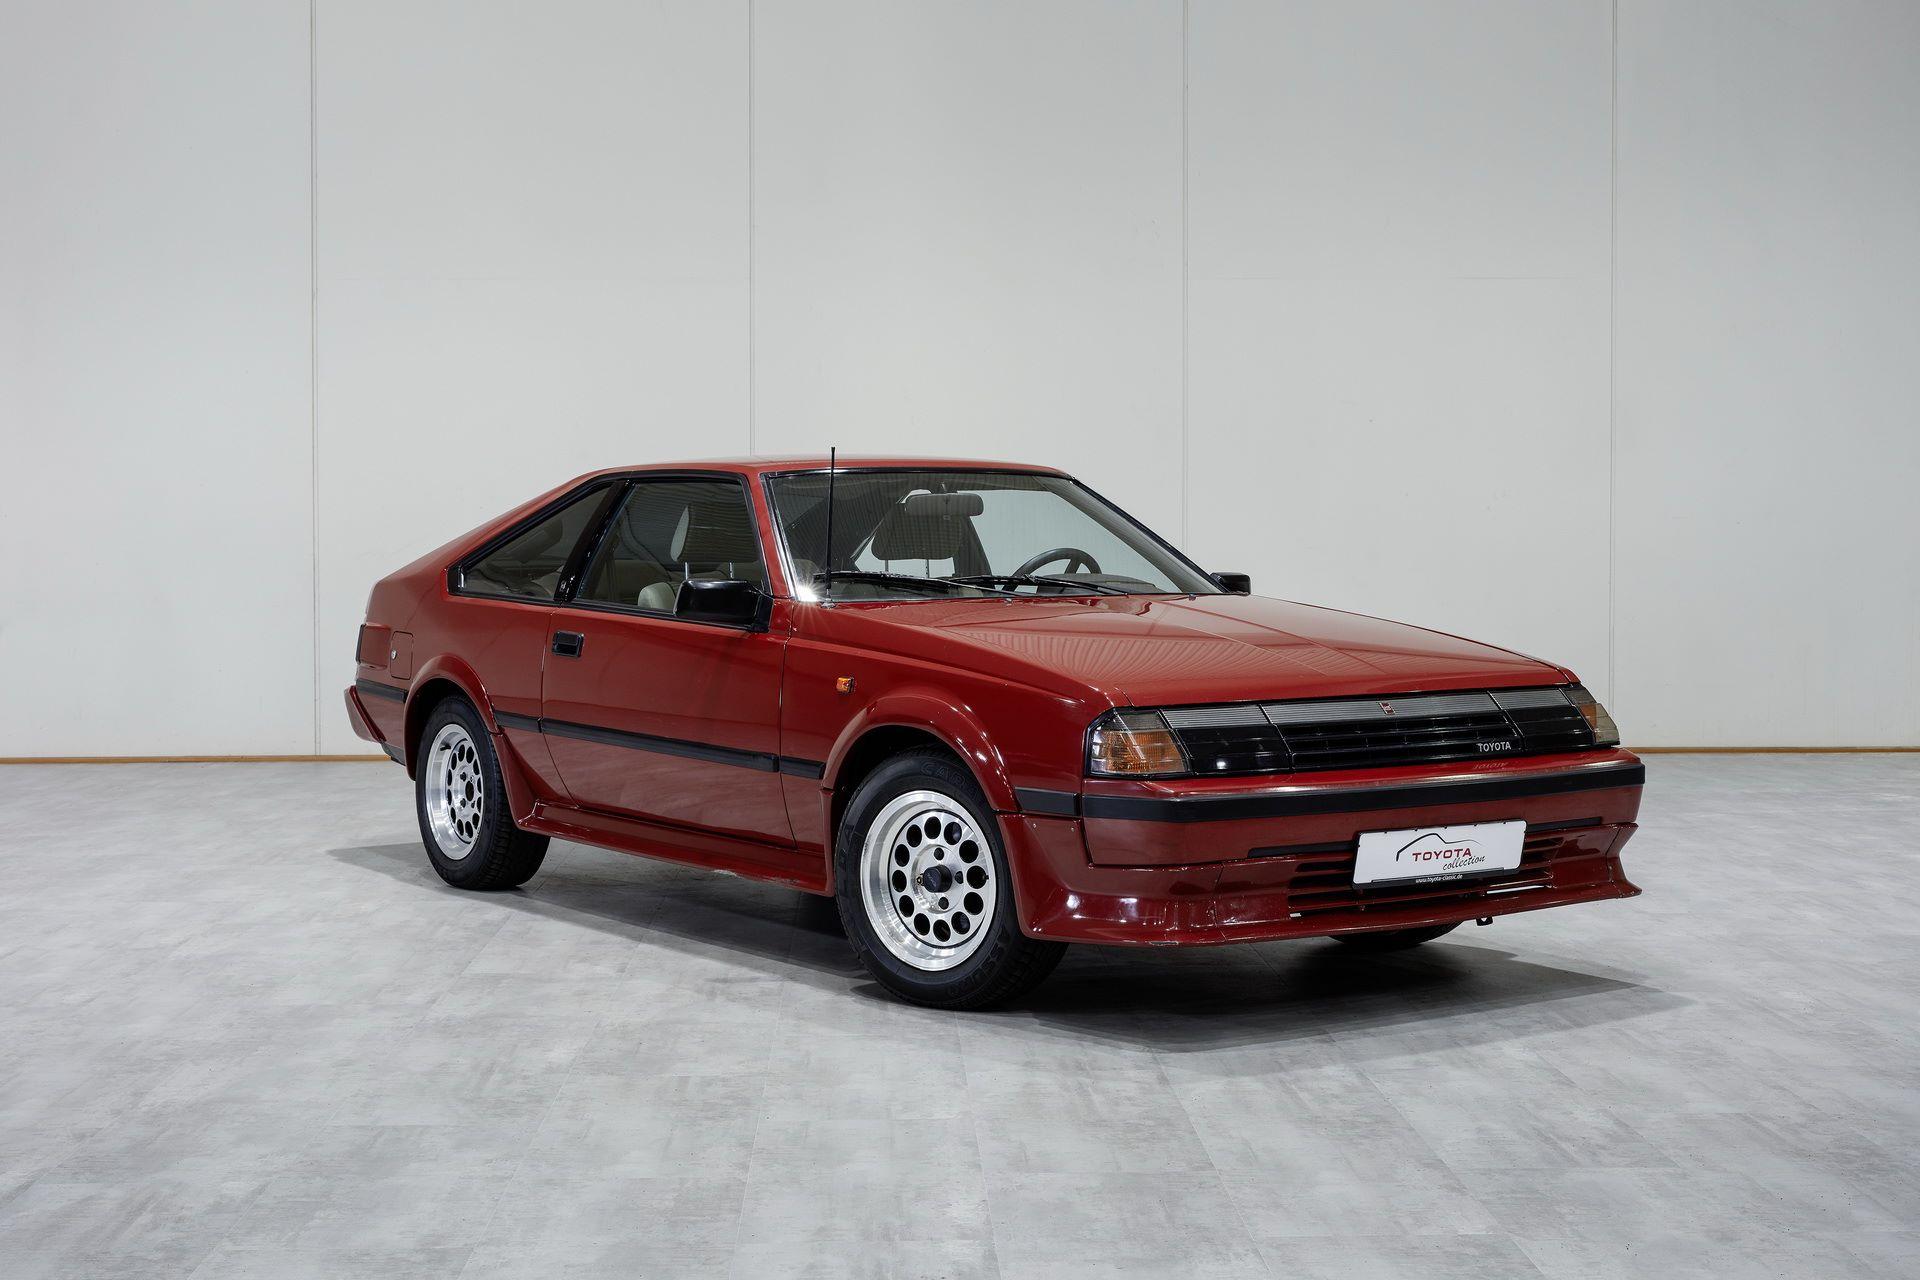 Toyota-Celica-50-years-9